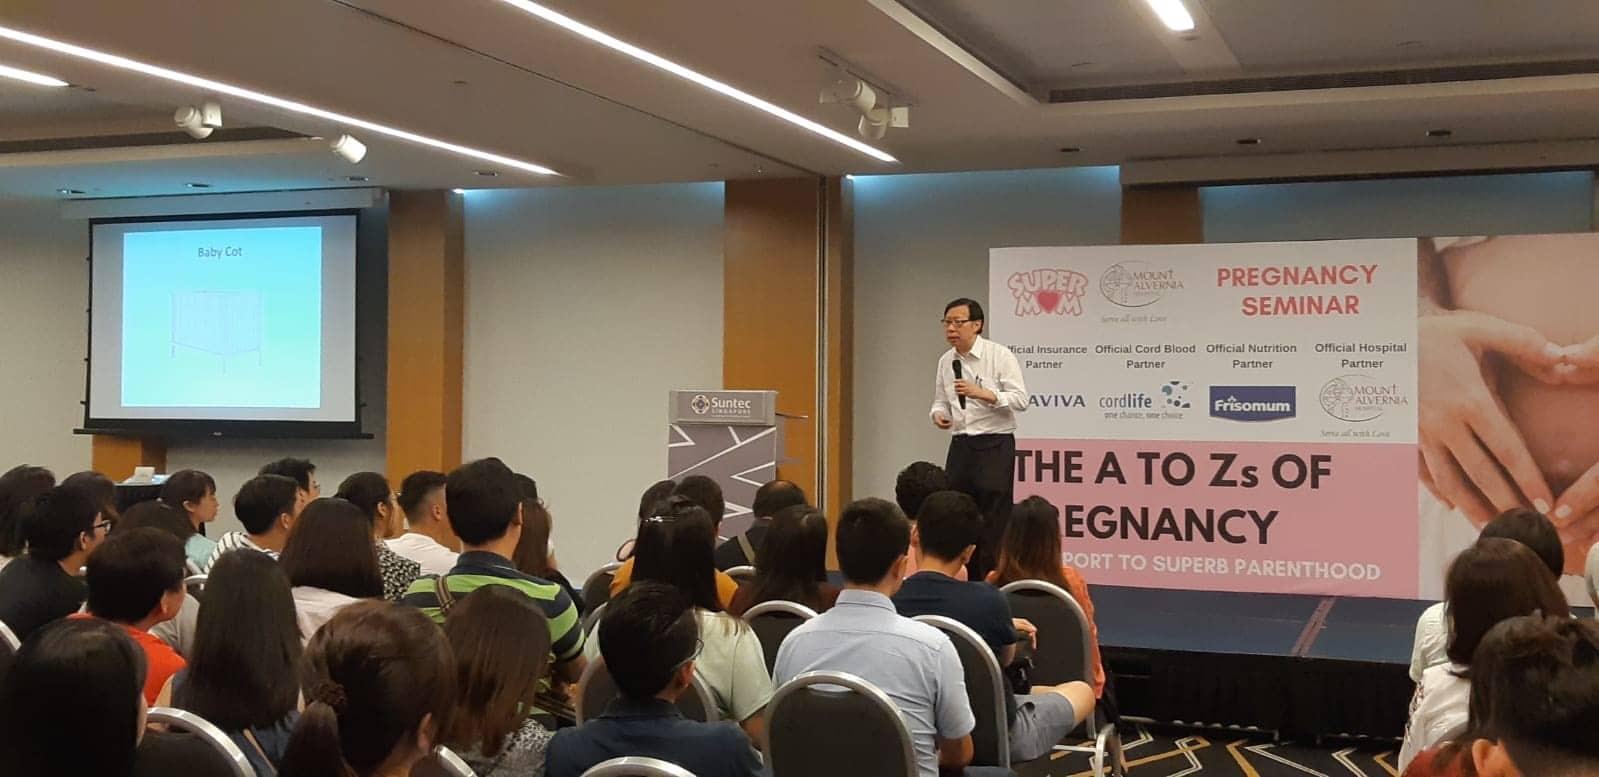 Doctor Simon Gives A Talk In A Pregnancy Seminar March 2019